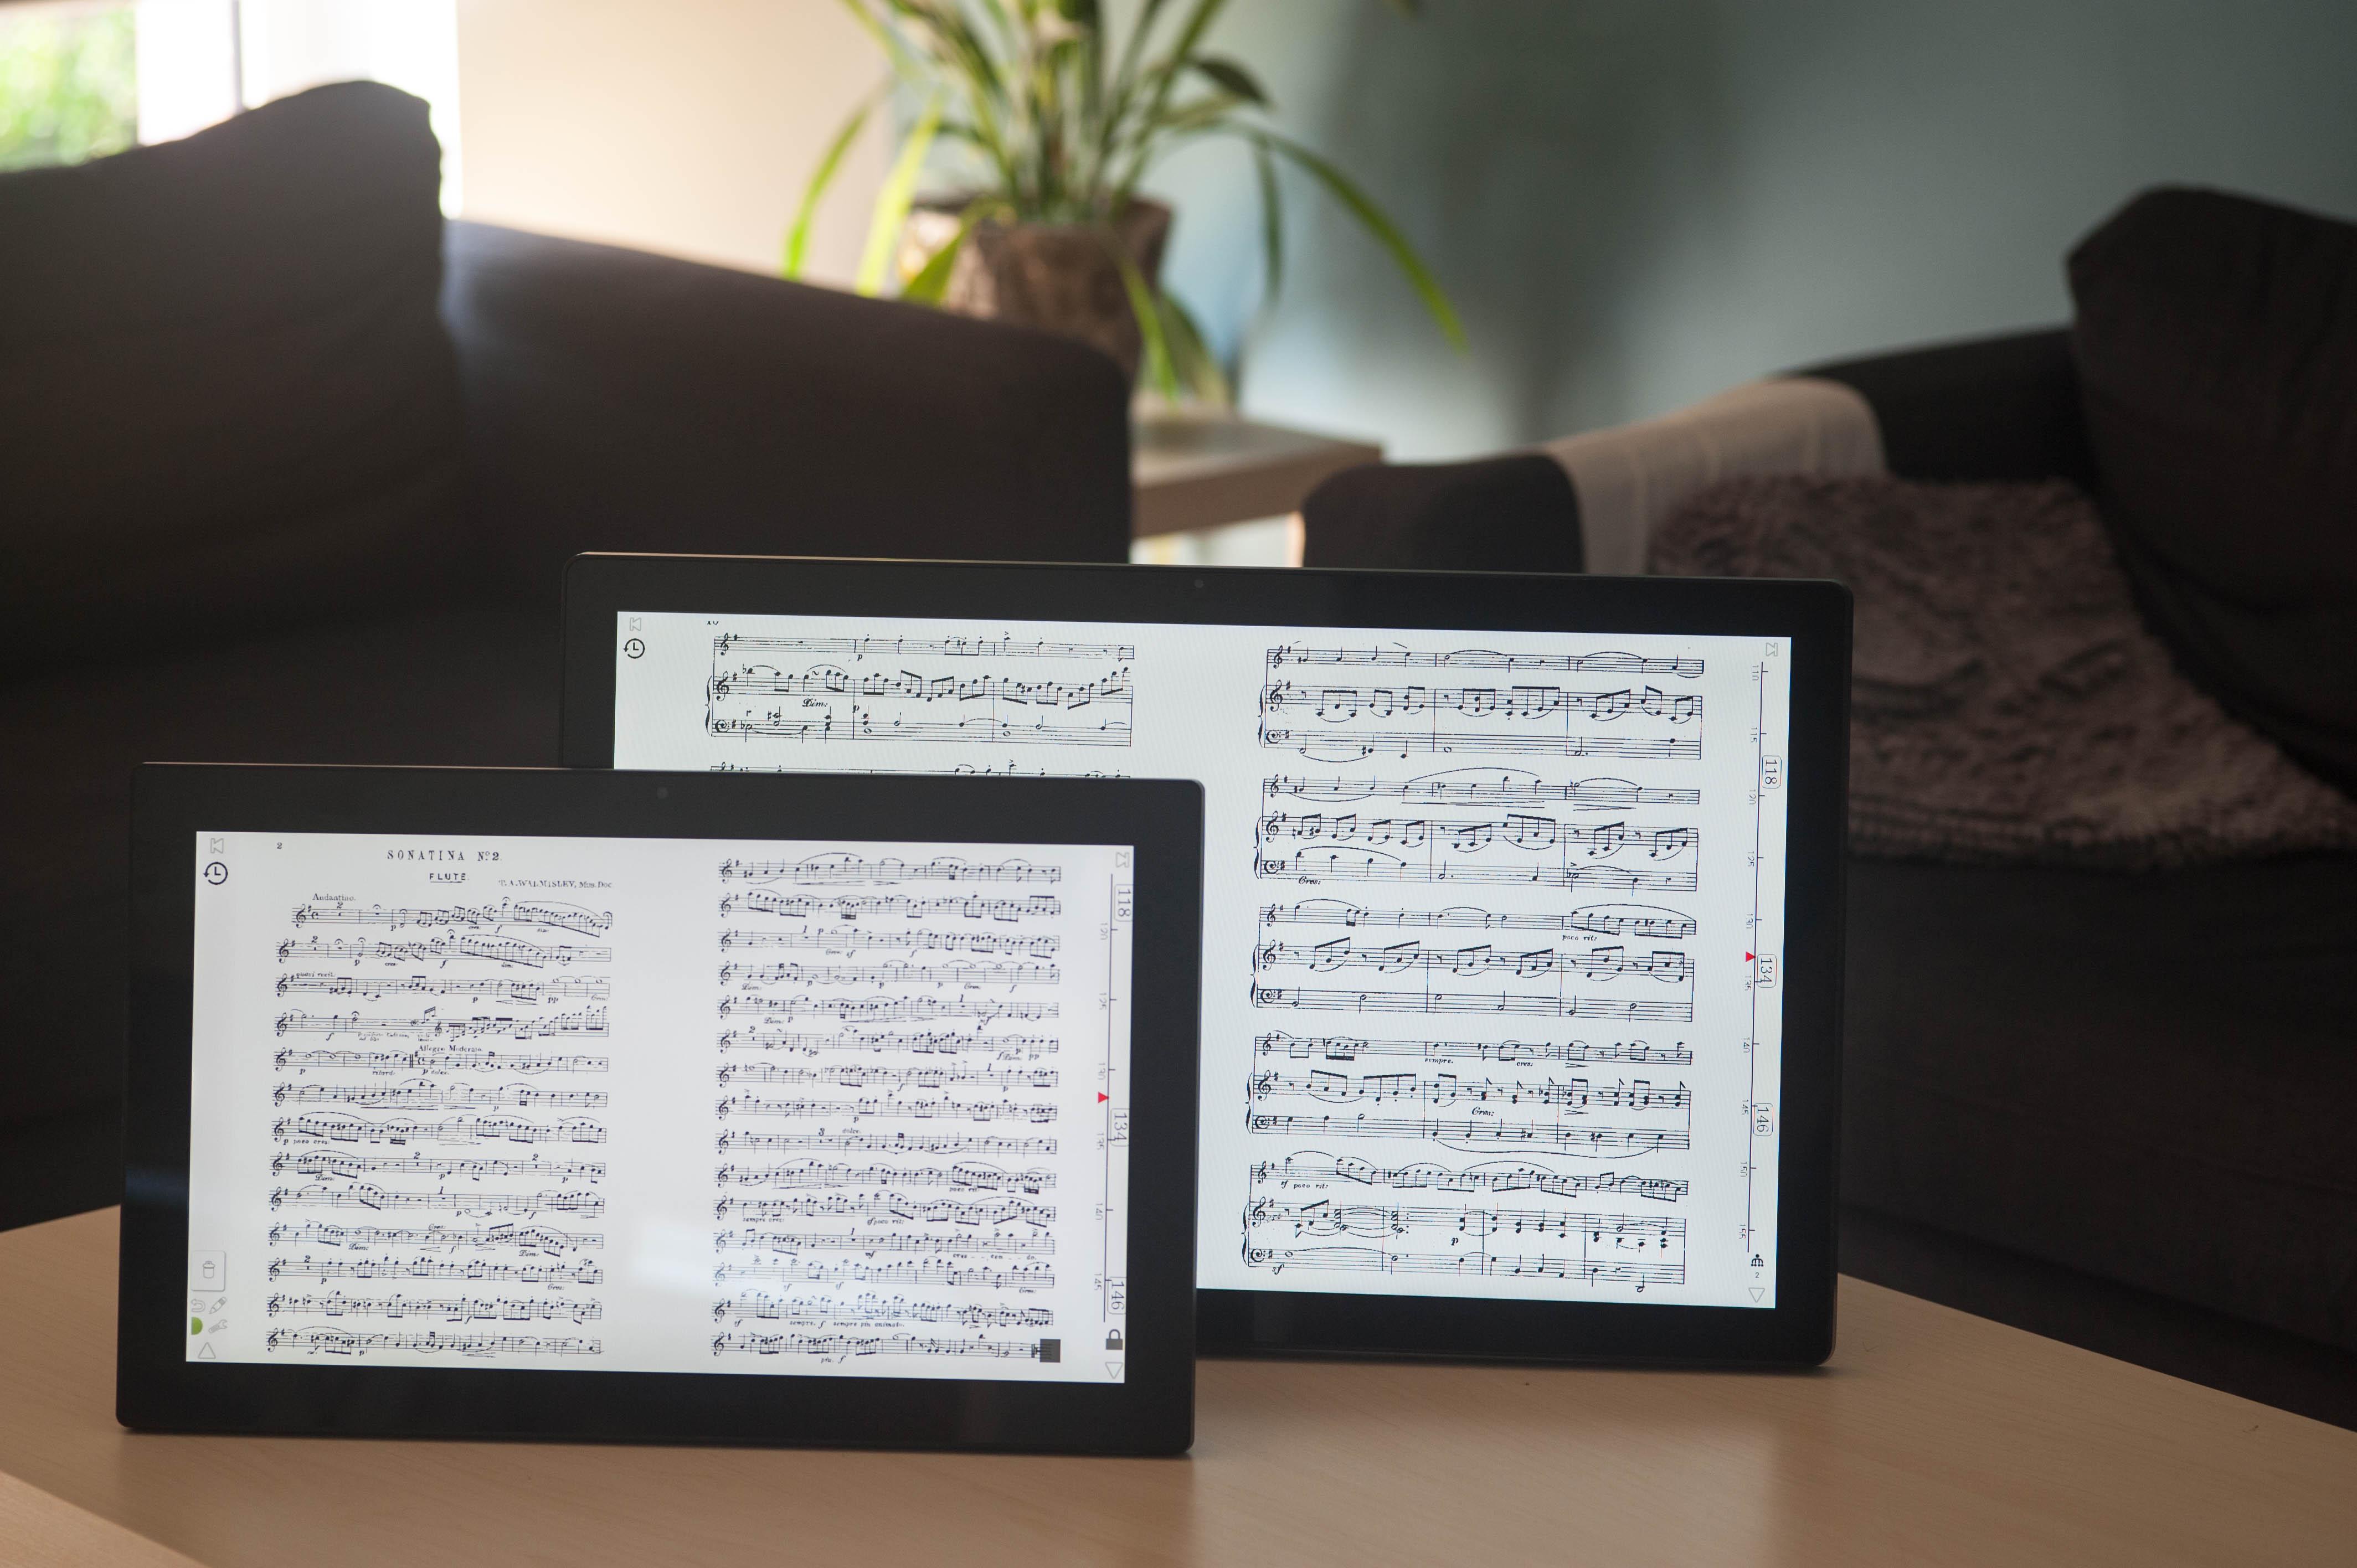 Scora Maestro in home environment